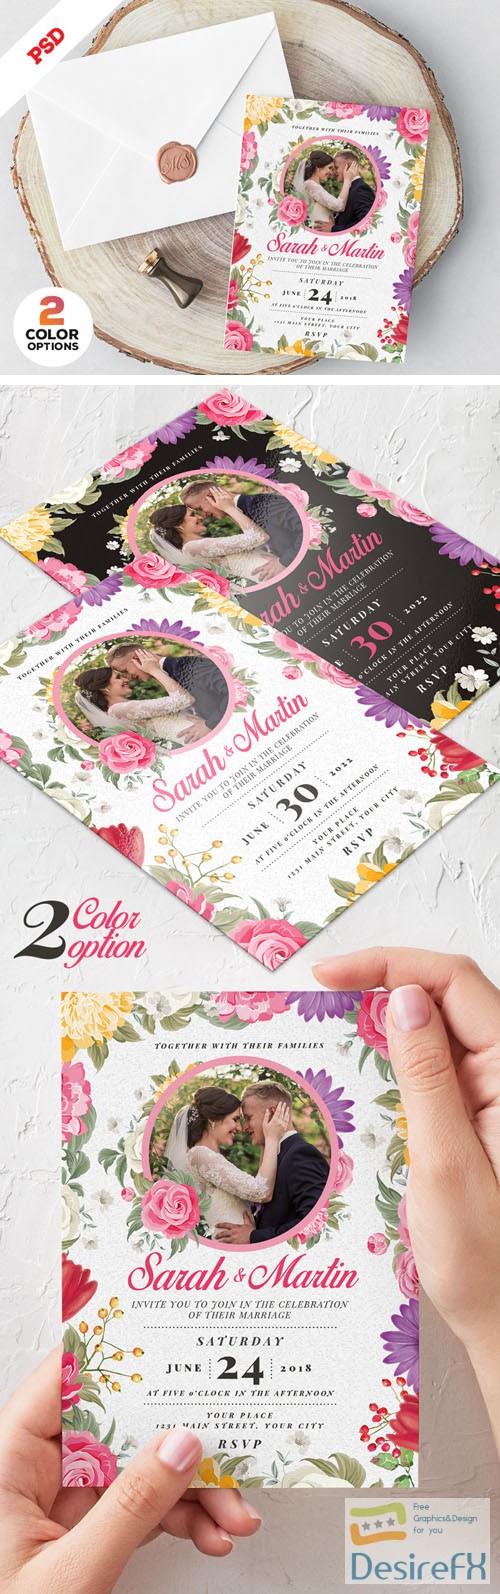 Desirefx Com Download Wedding Invitation Card Design Psd